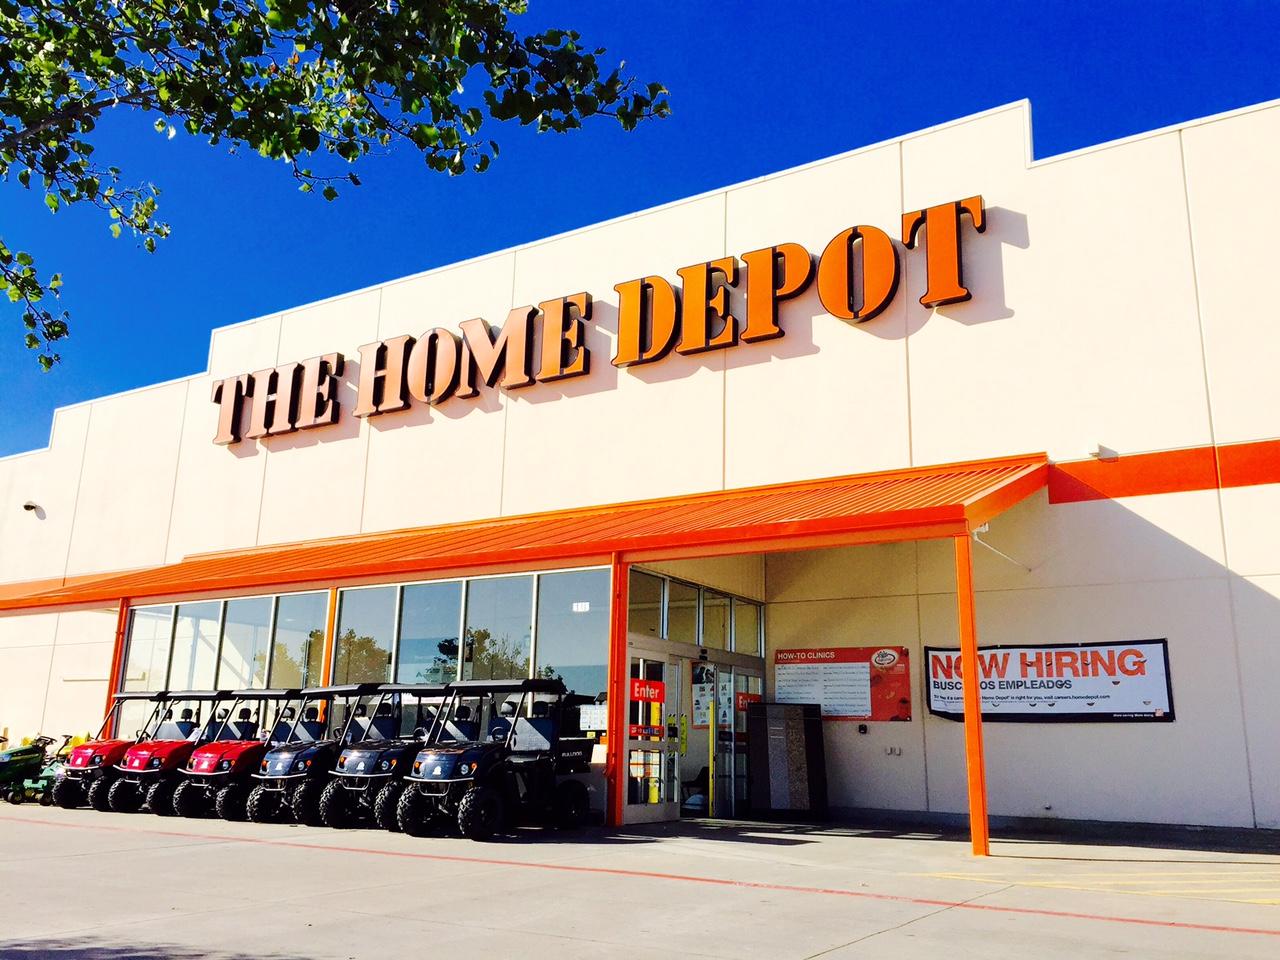 the home depot in baytown tx 77521. Black Bedroom Furniture Sets. Home Design Ideas